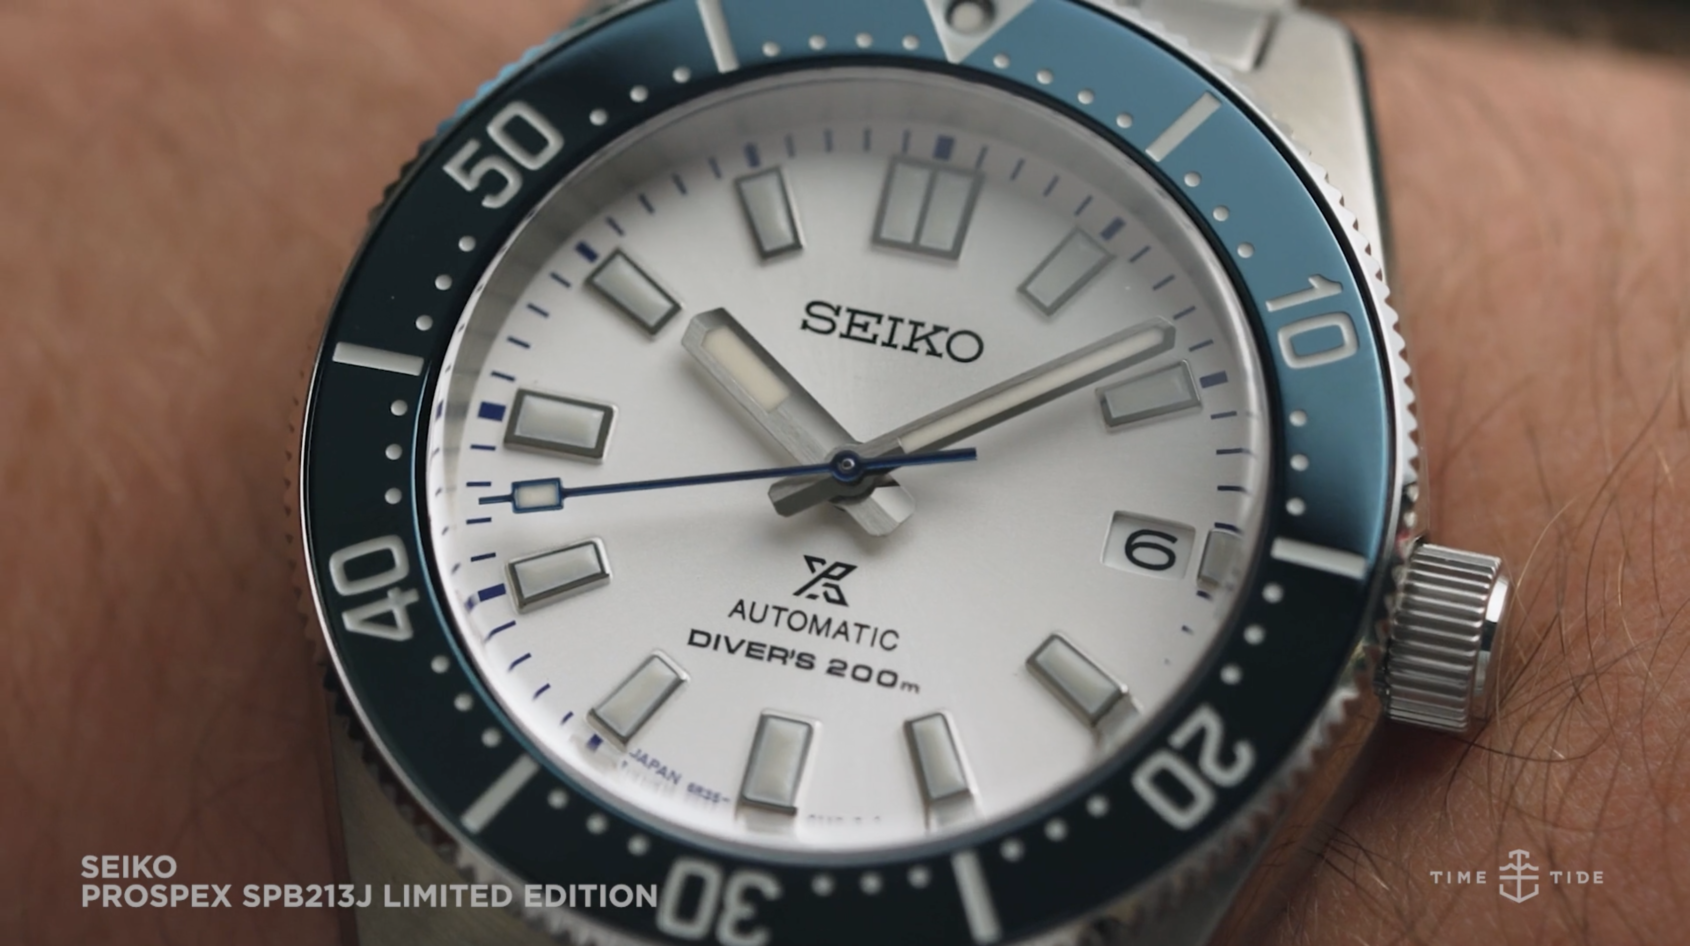 Seiko Prospex SPB213J1